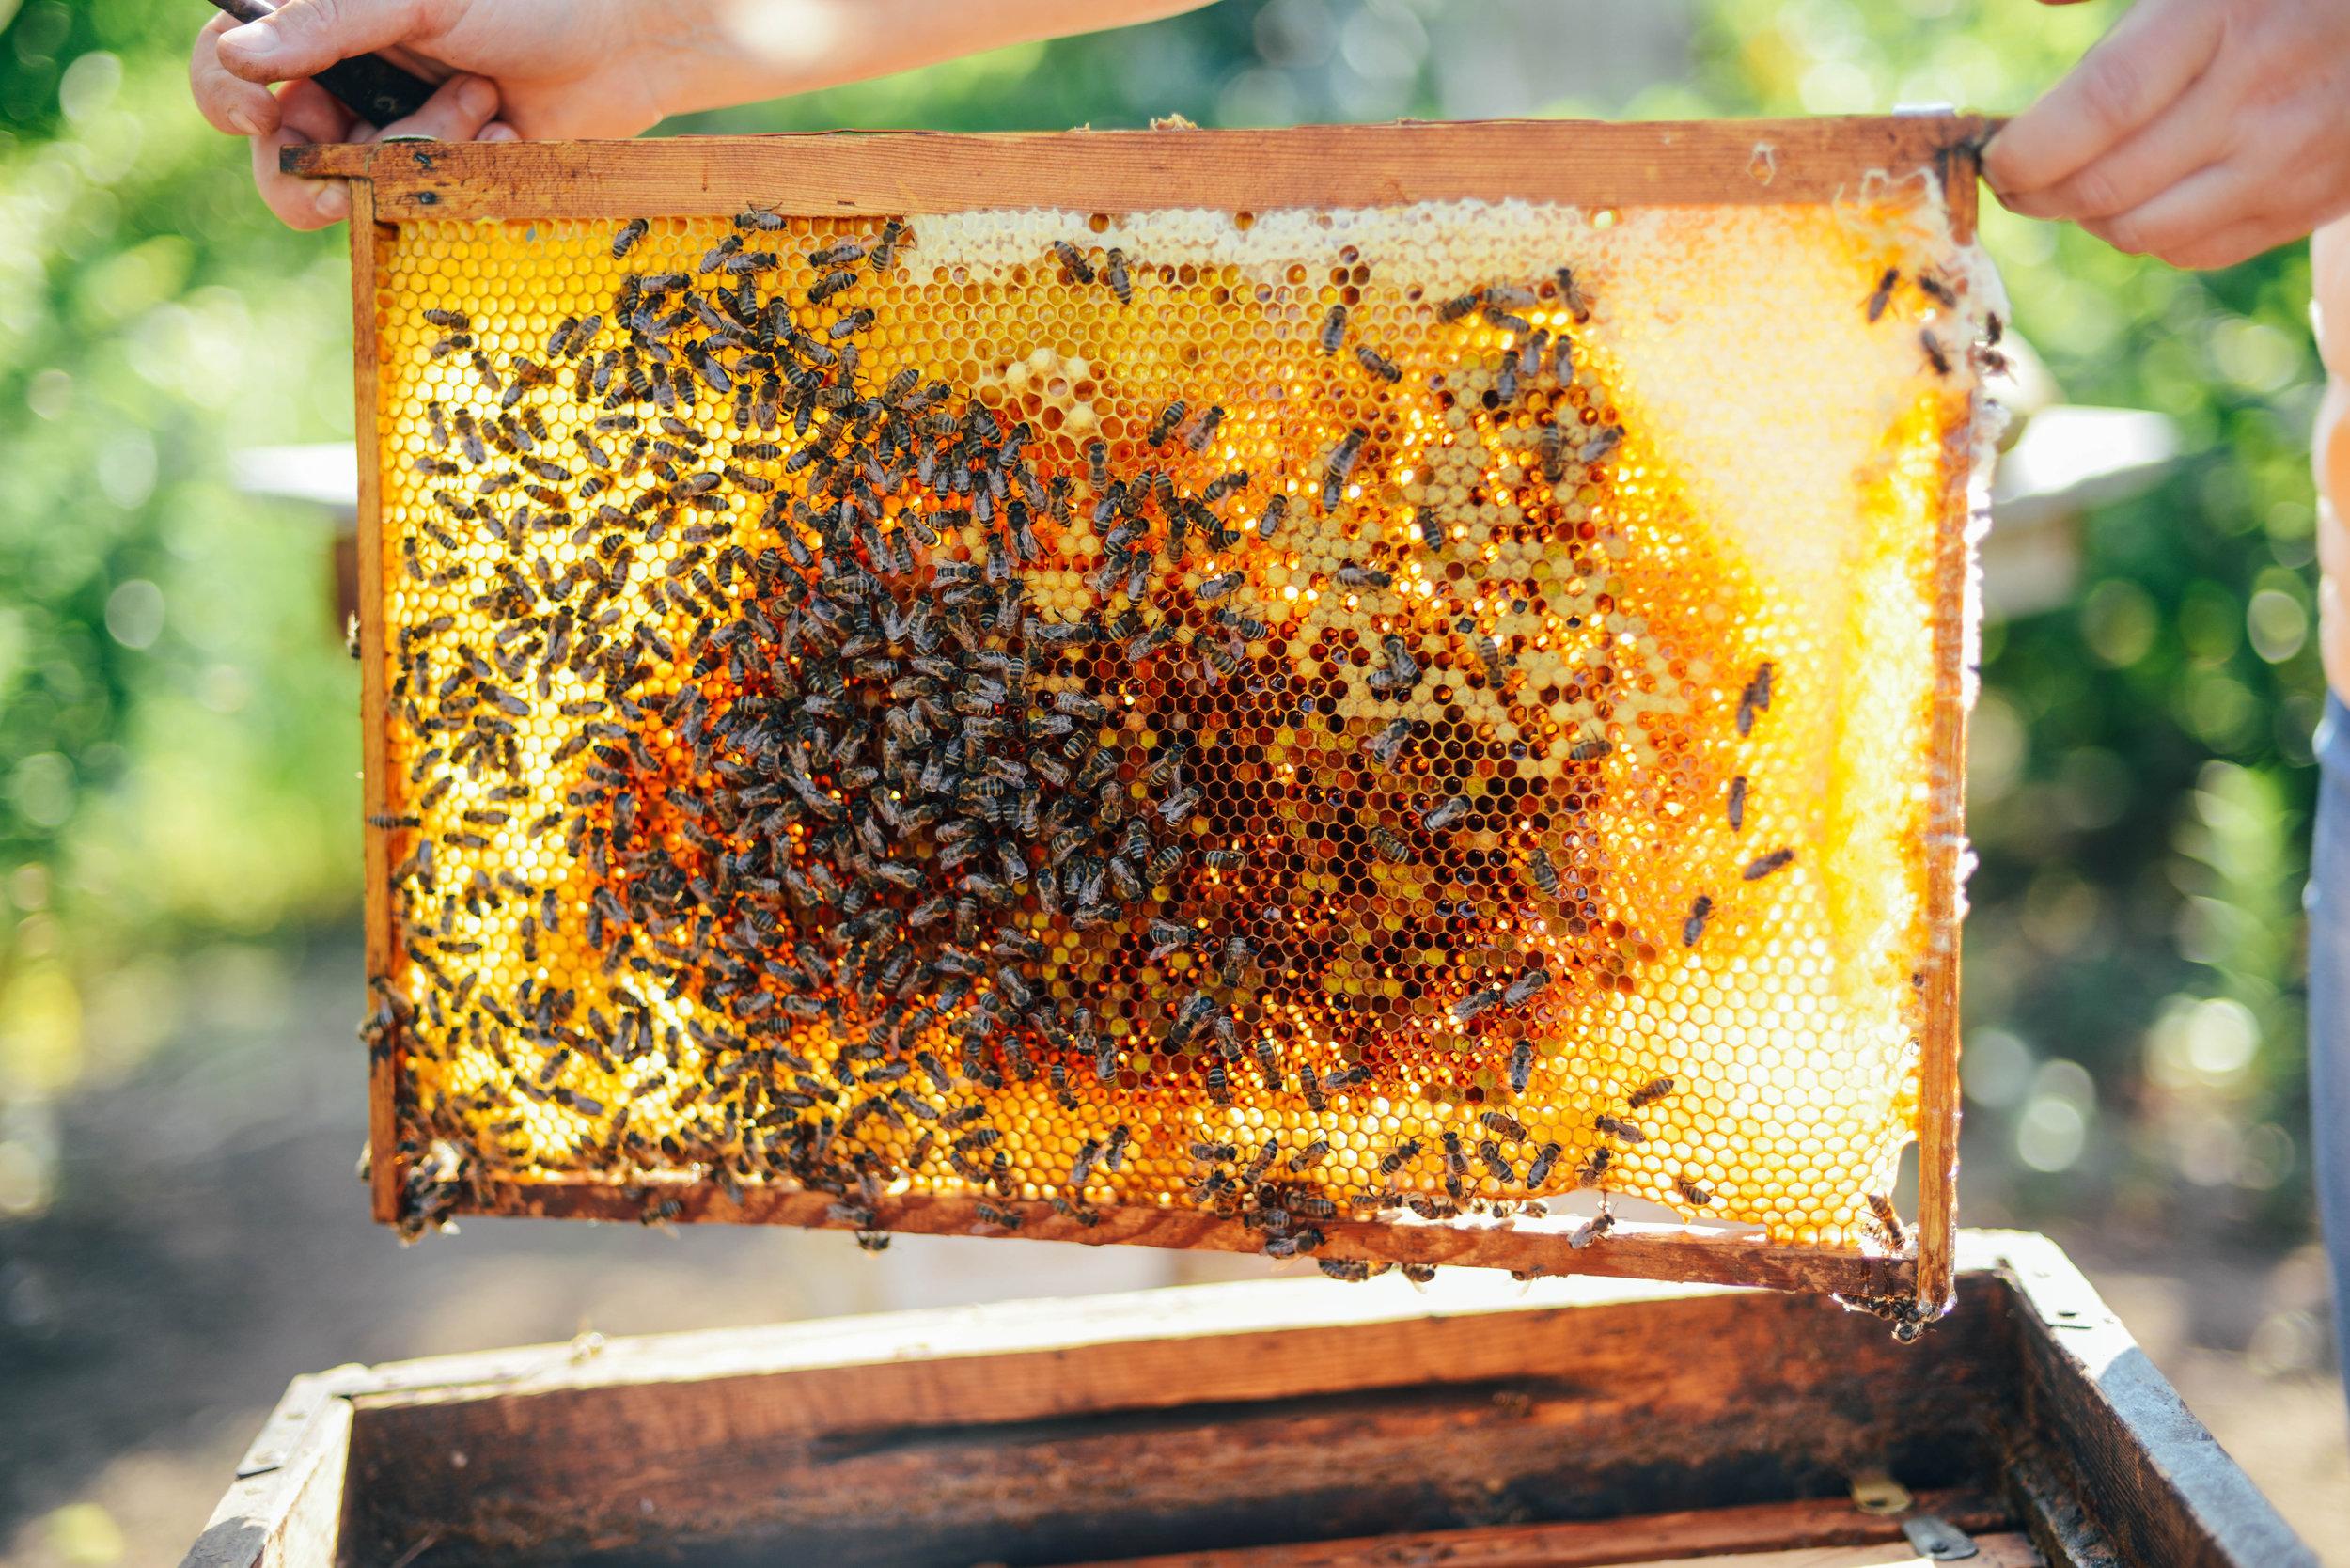 bigstock-Frames-Of-A-Bee-Hive-Beekeepe-194932189.jpg